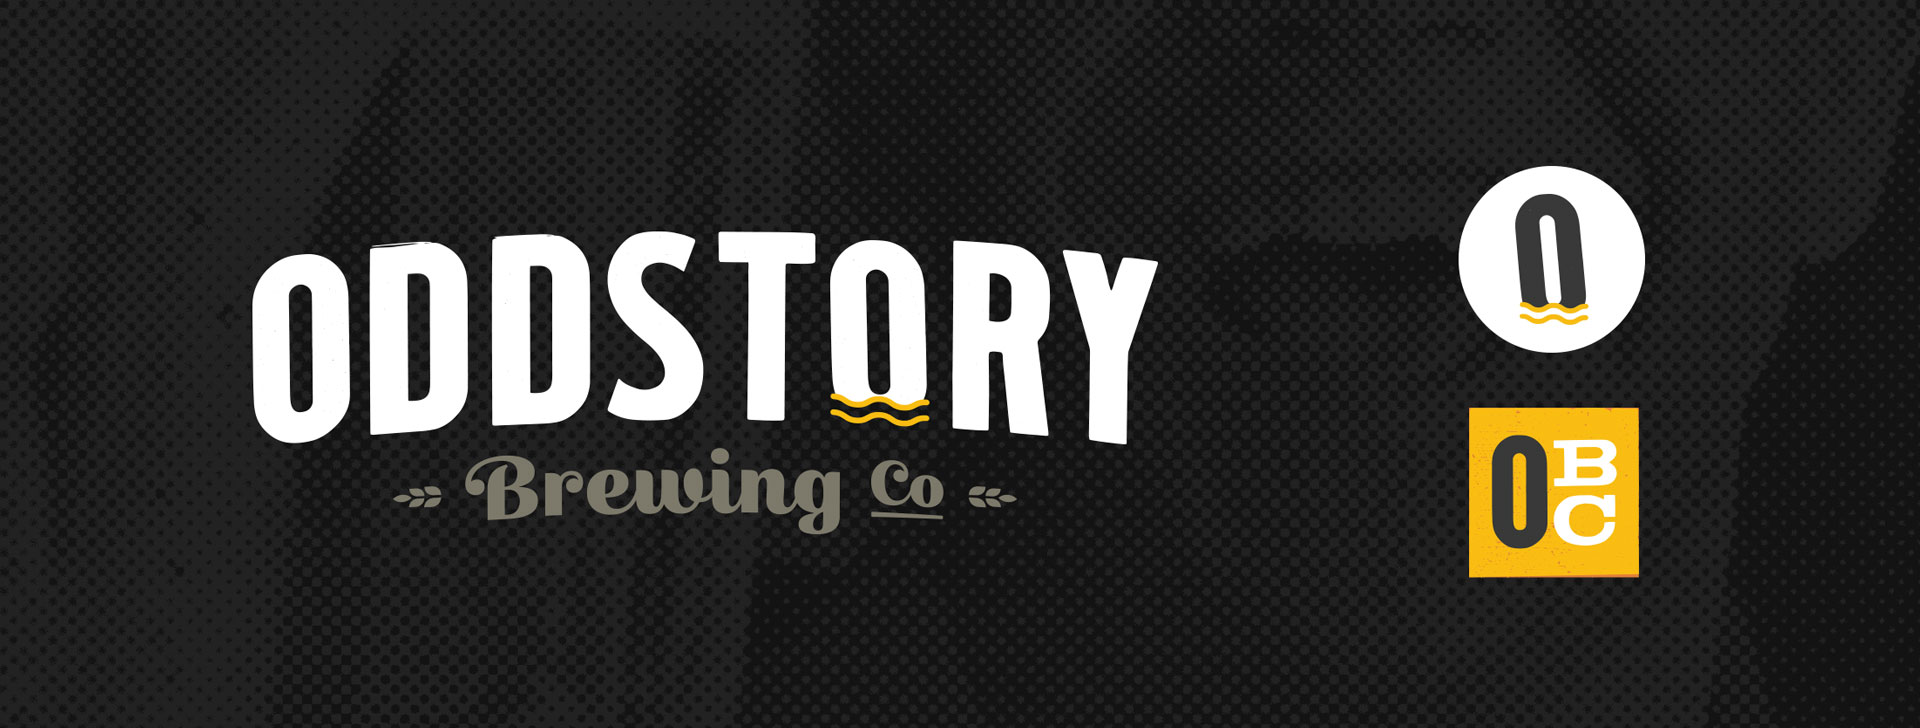 OddStory Brewing Co. - Identity, Logos, Social Media Icons